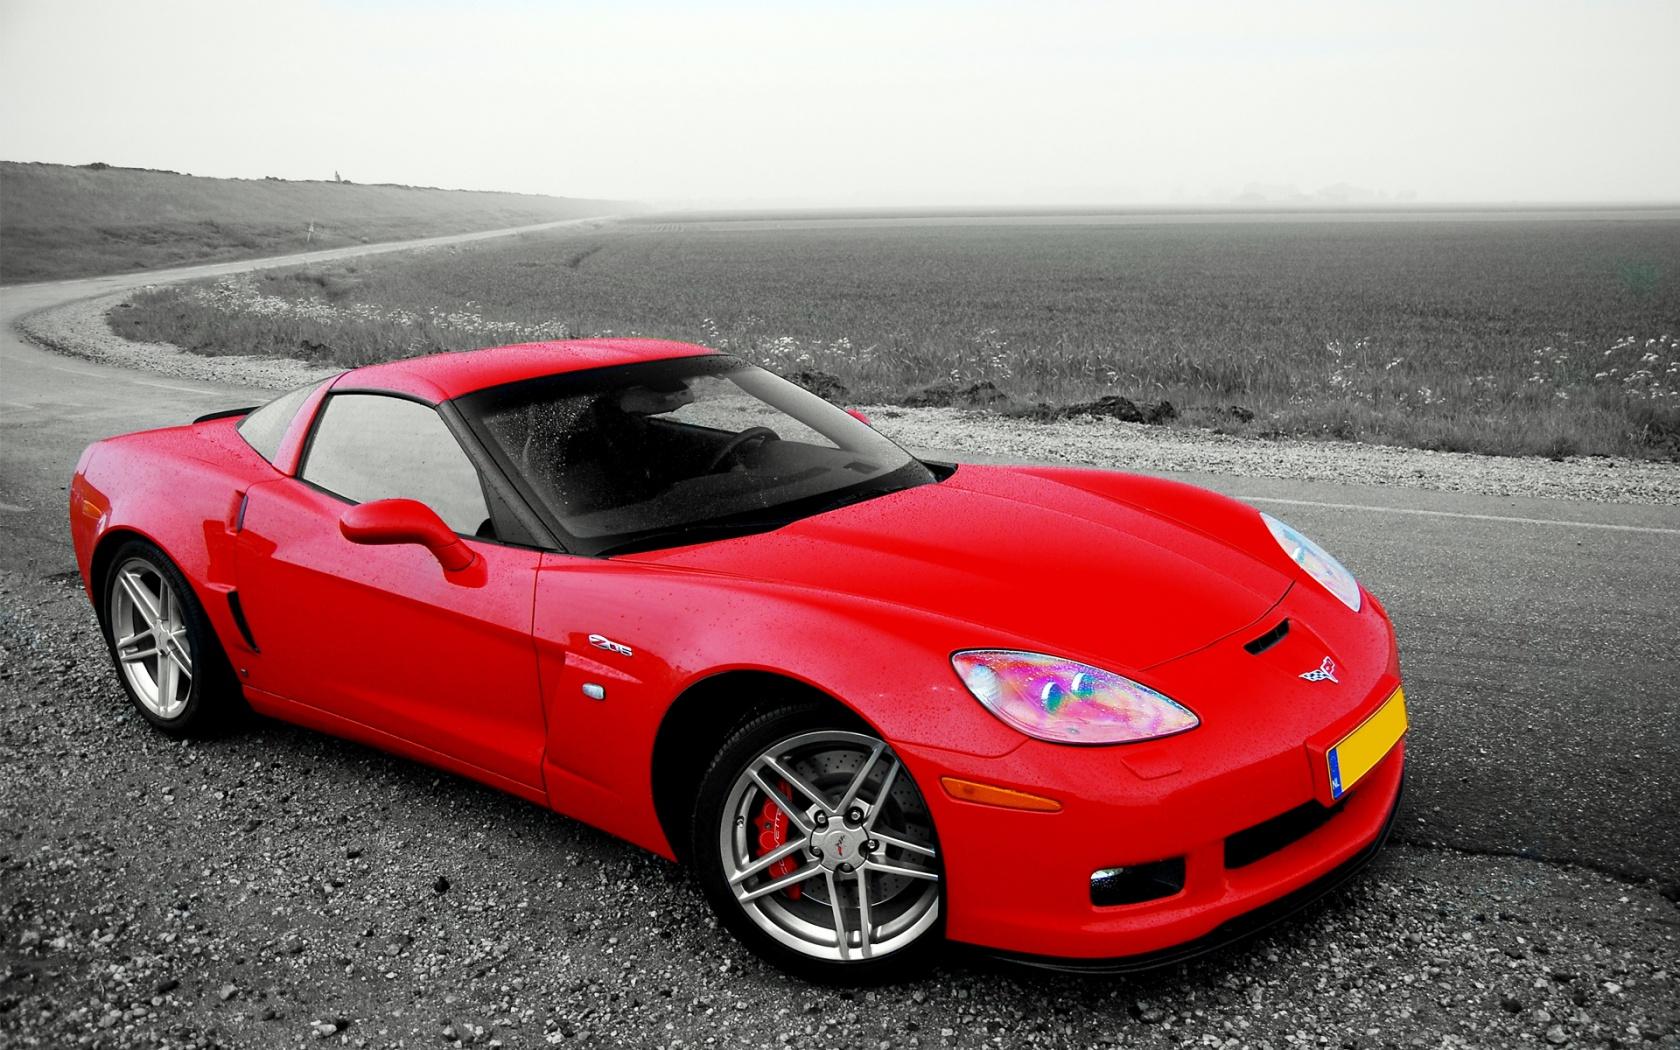 Chevrolet Corvette C6 Z06 Red   1680x1050   674908 1680x1050